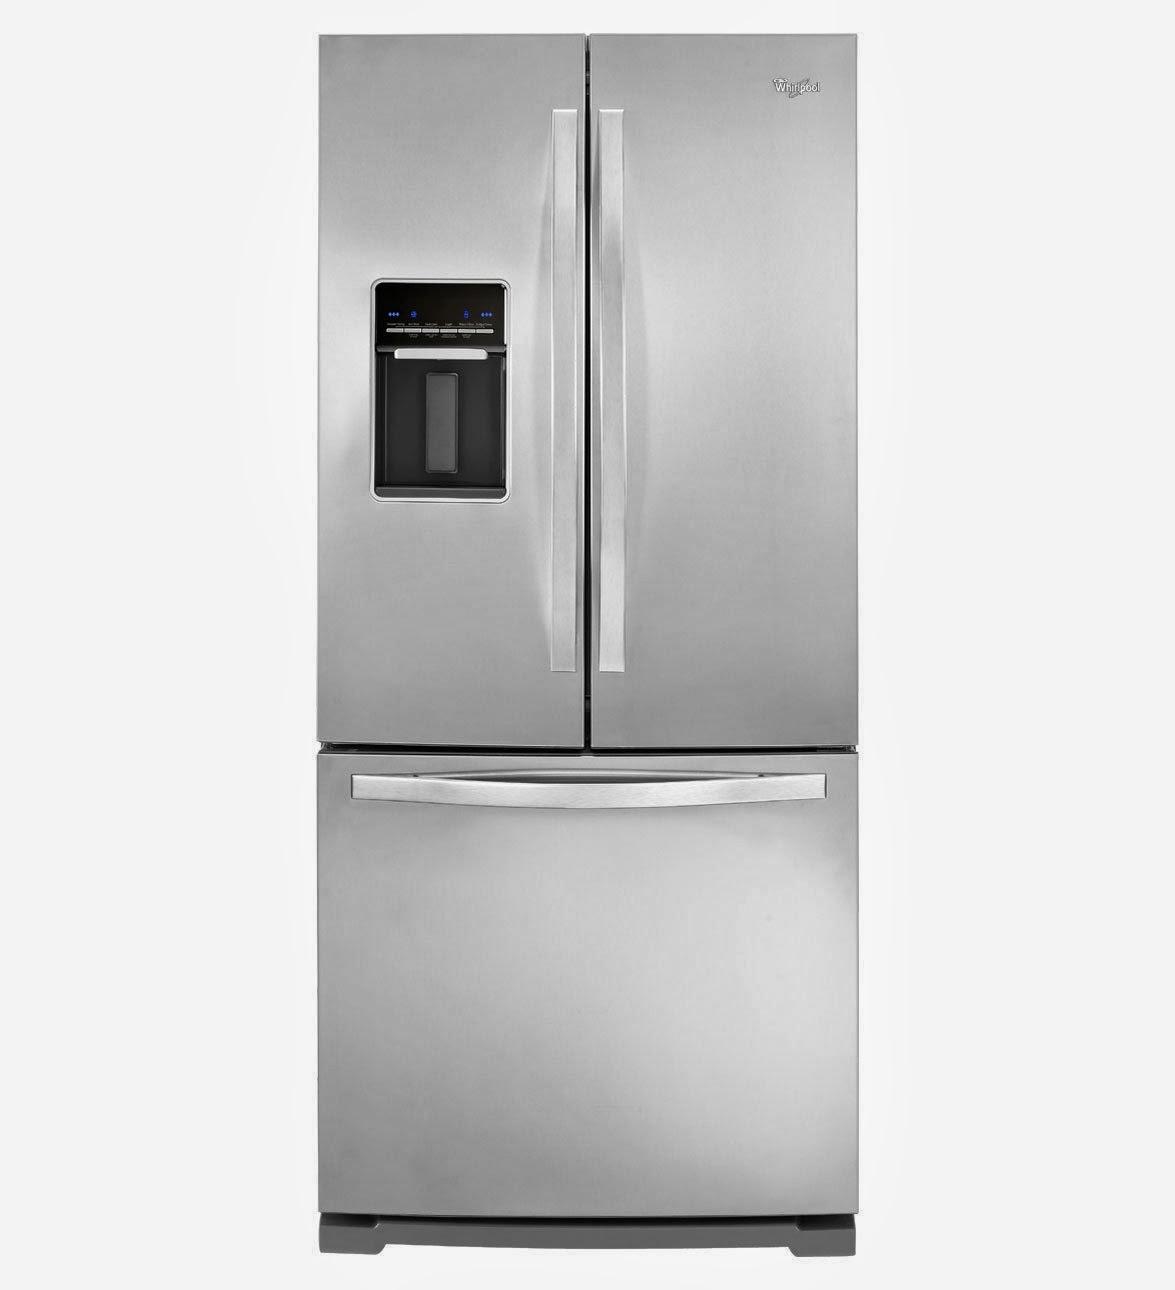 small refrigerator online store small refrigerator. Black Bedroom Furniture Sets. Home Design Ideas